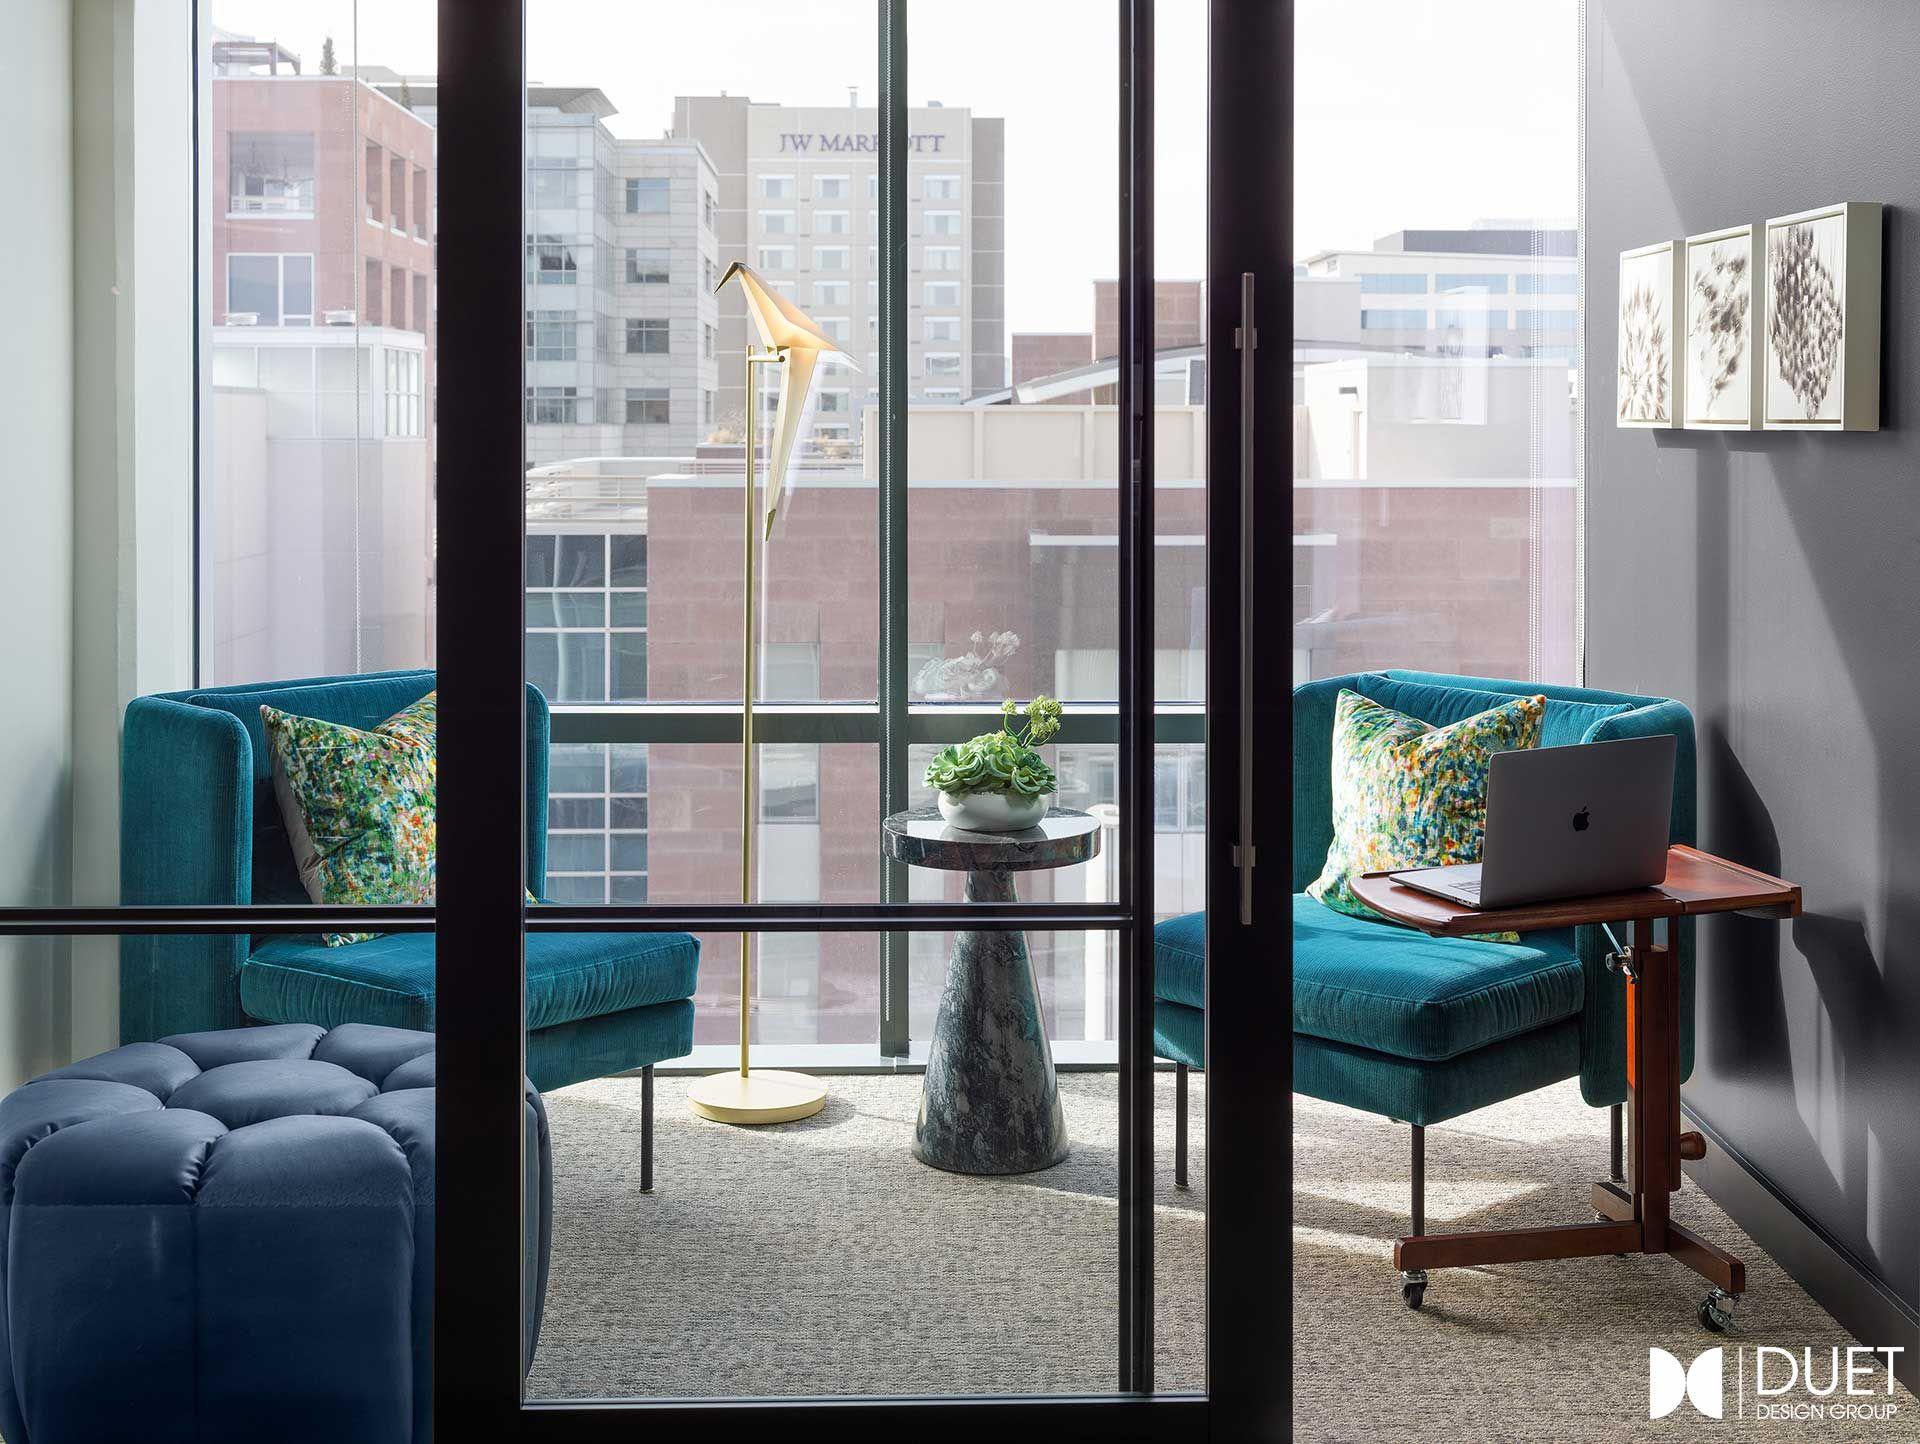 Pin By Nicola Matthews On Mez Meeting Room Design Interior Design Inspiration Design